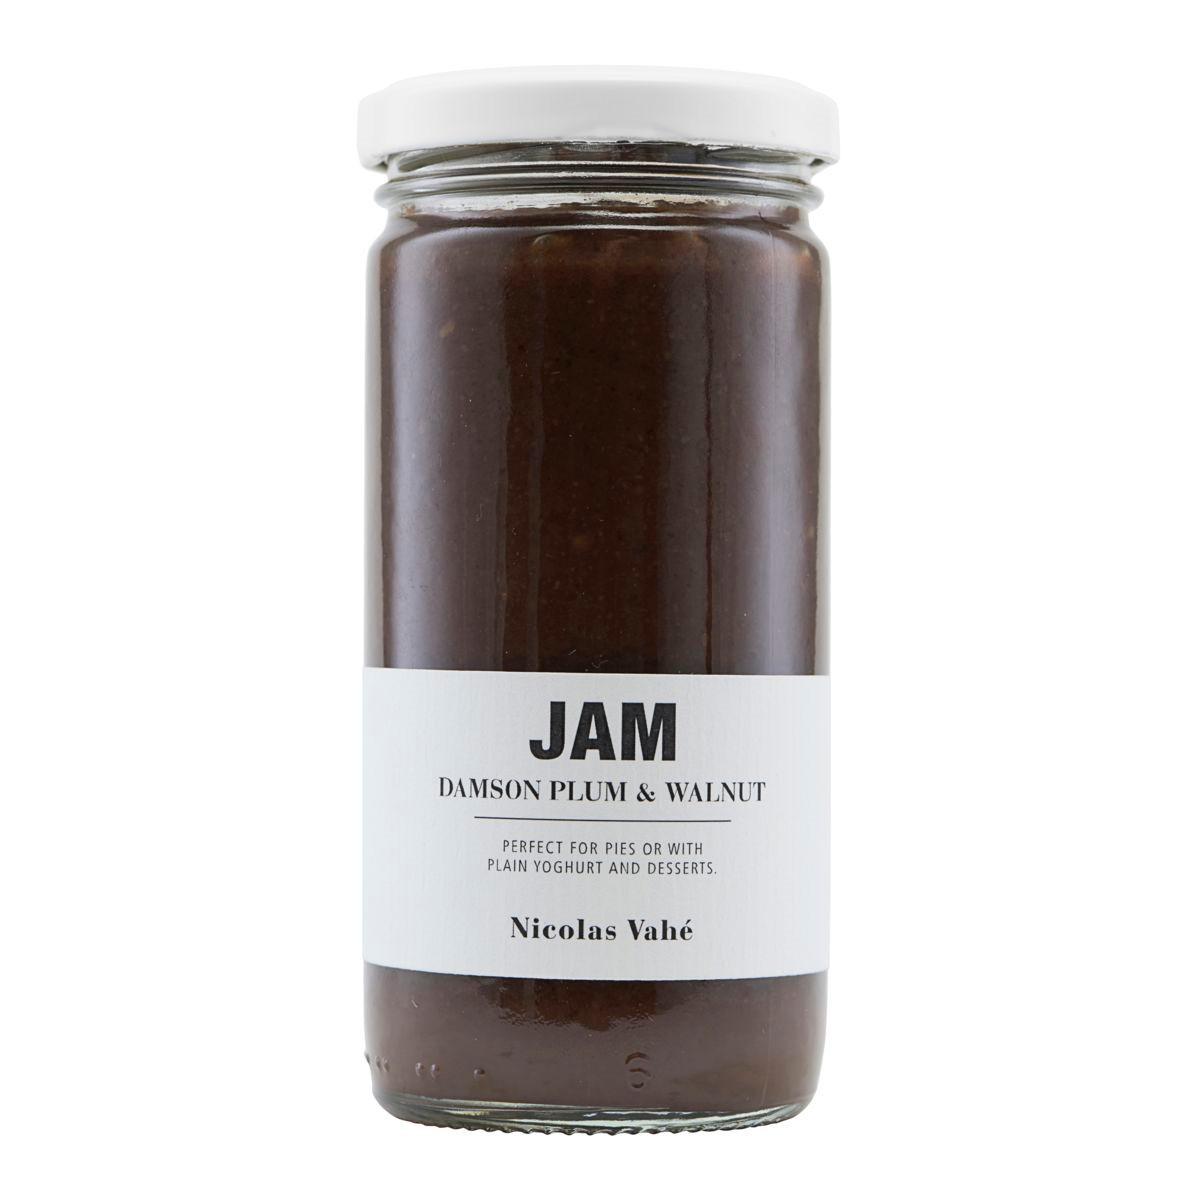 Nicolas Vahé Jam Damson Plum & Walnut